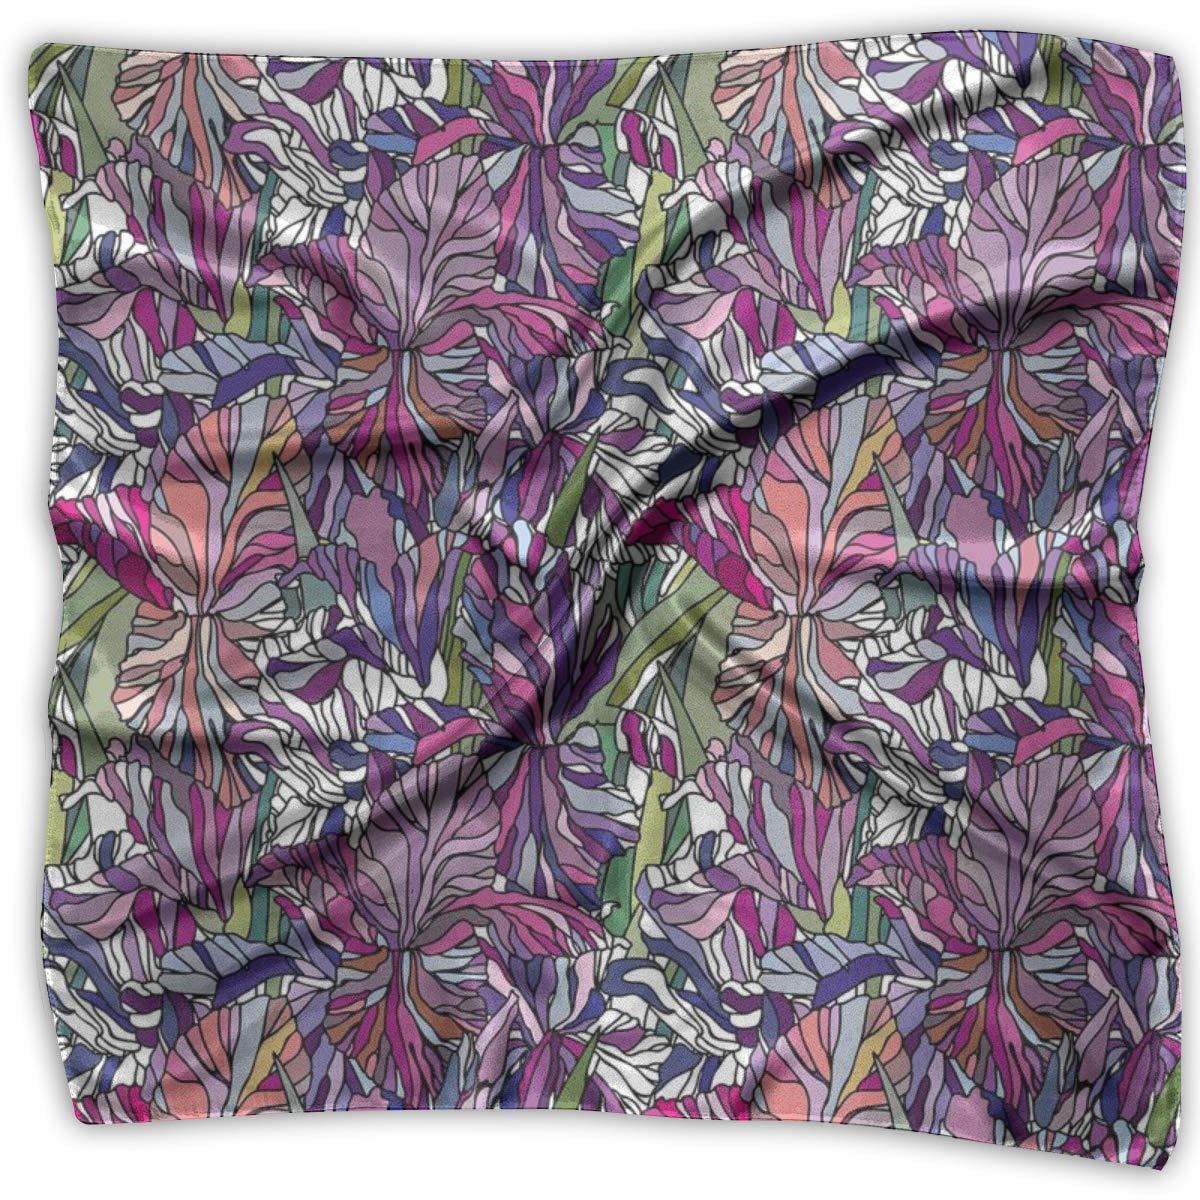 Bandana Head and Neck Tie Neckerchief,Tropical Jungle Rainforest Artistic Abstraction Narcissus Iris Vintage Style Nature,Headband